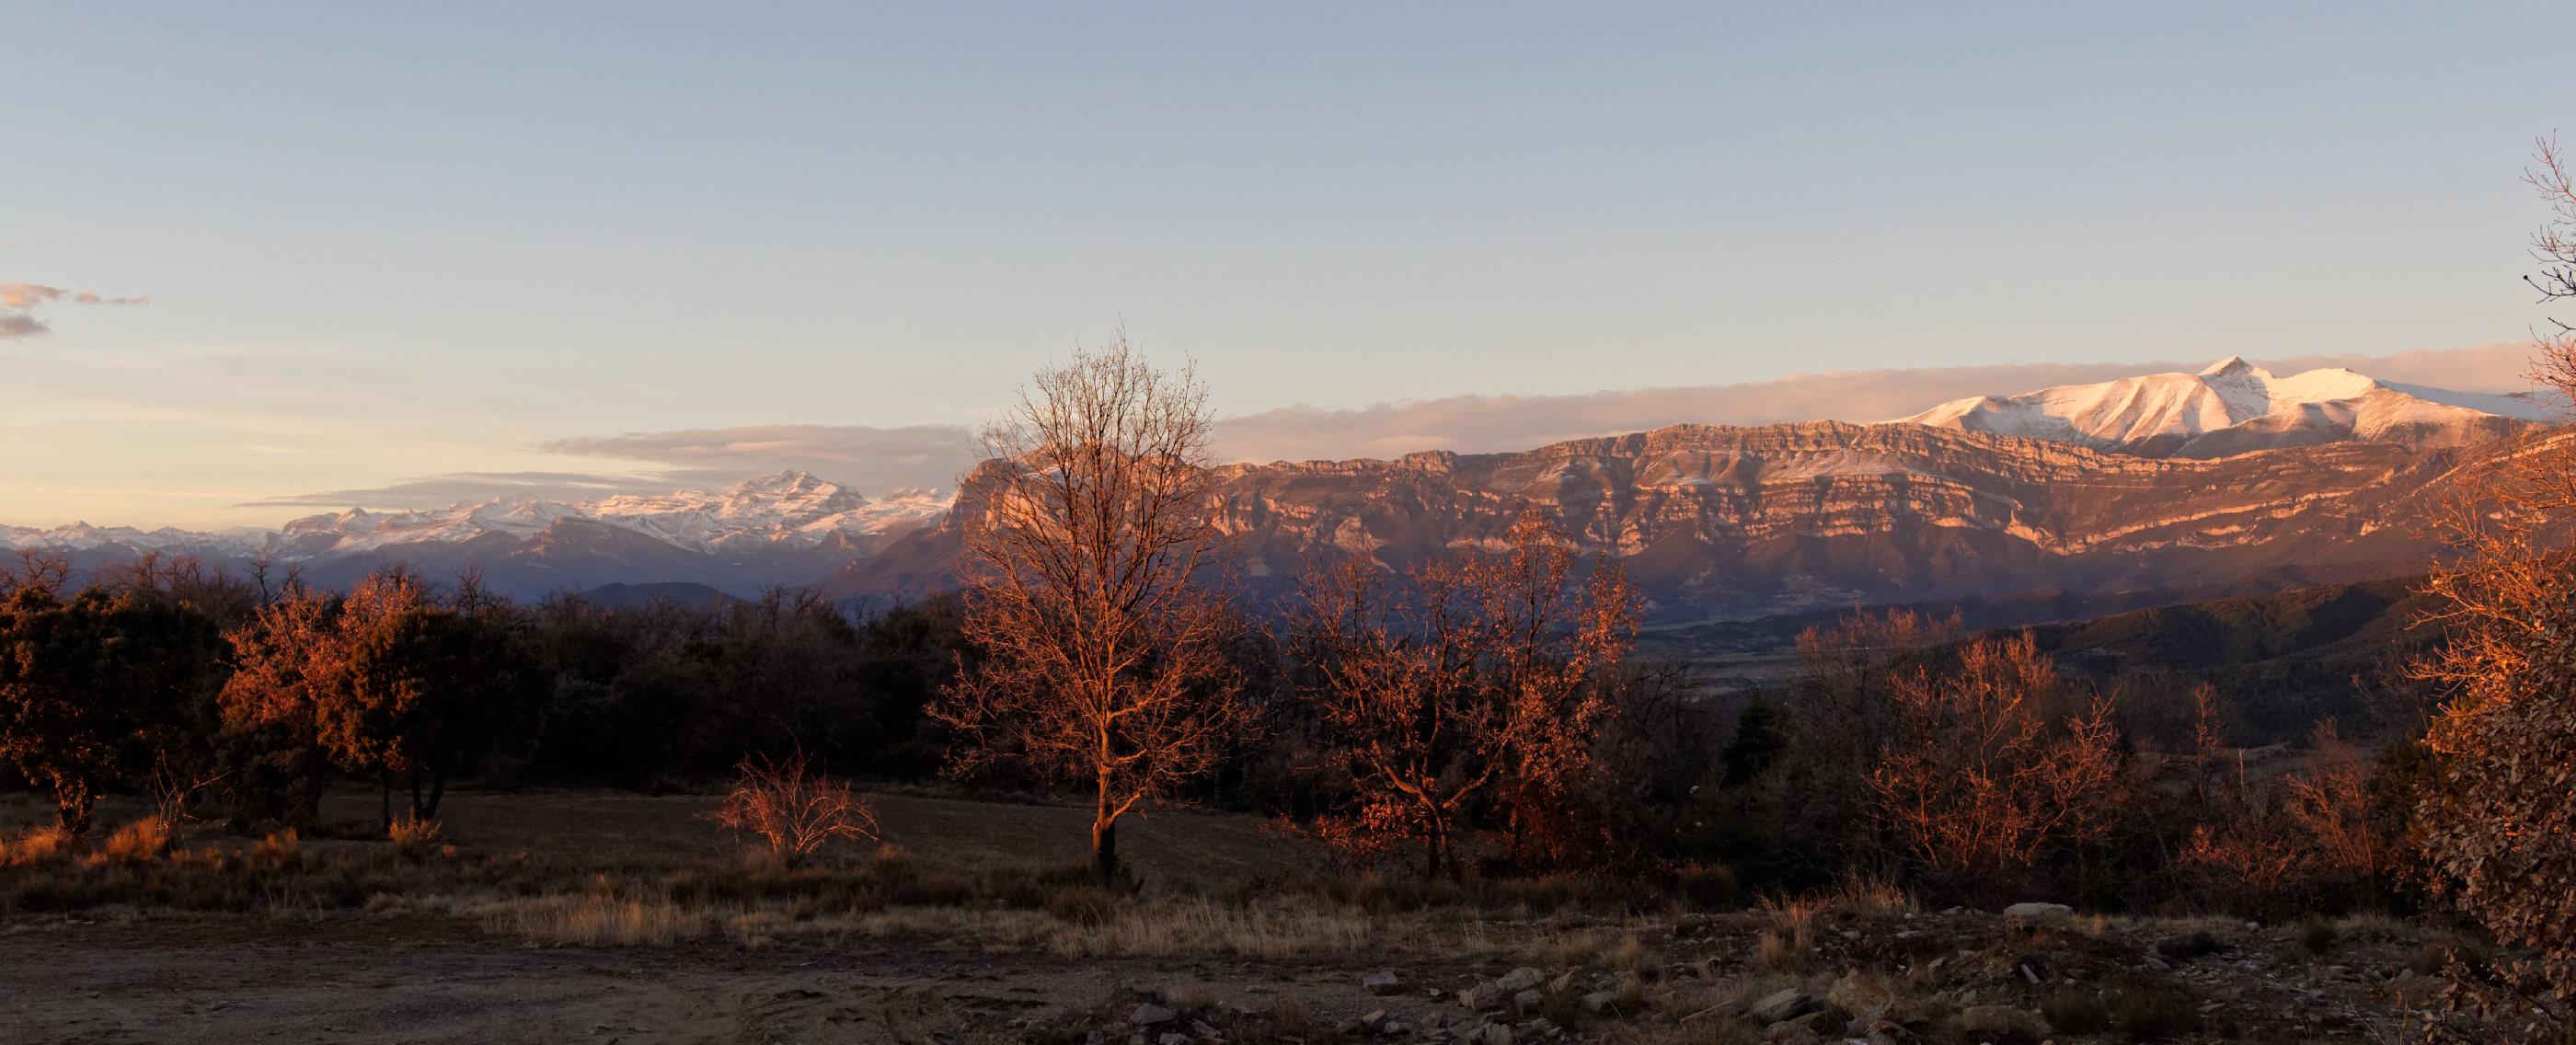 150125-Route de Trillo (Sobrarbe-La Fueva) (19)